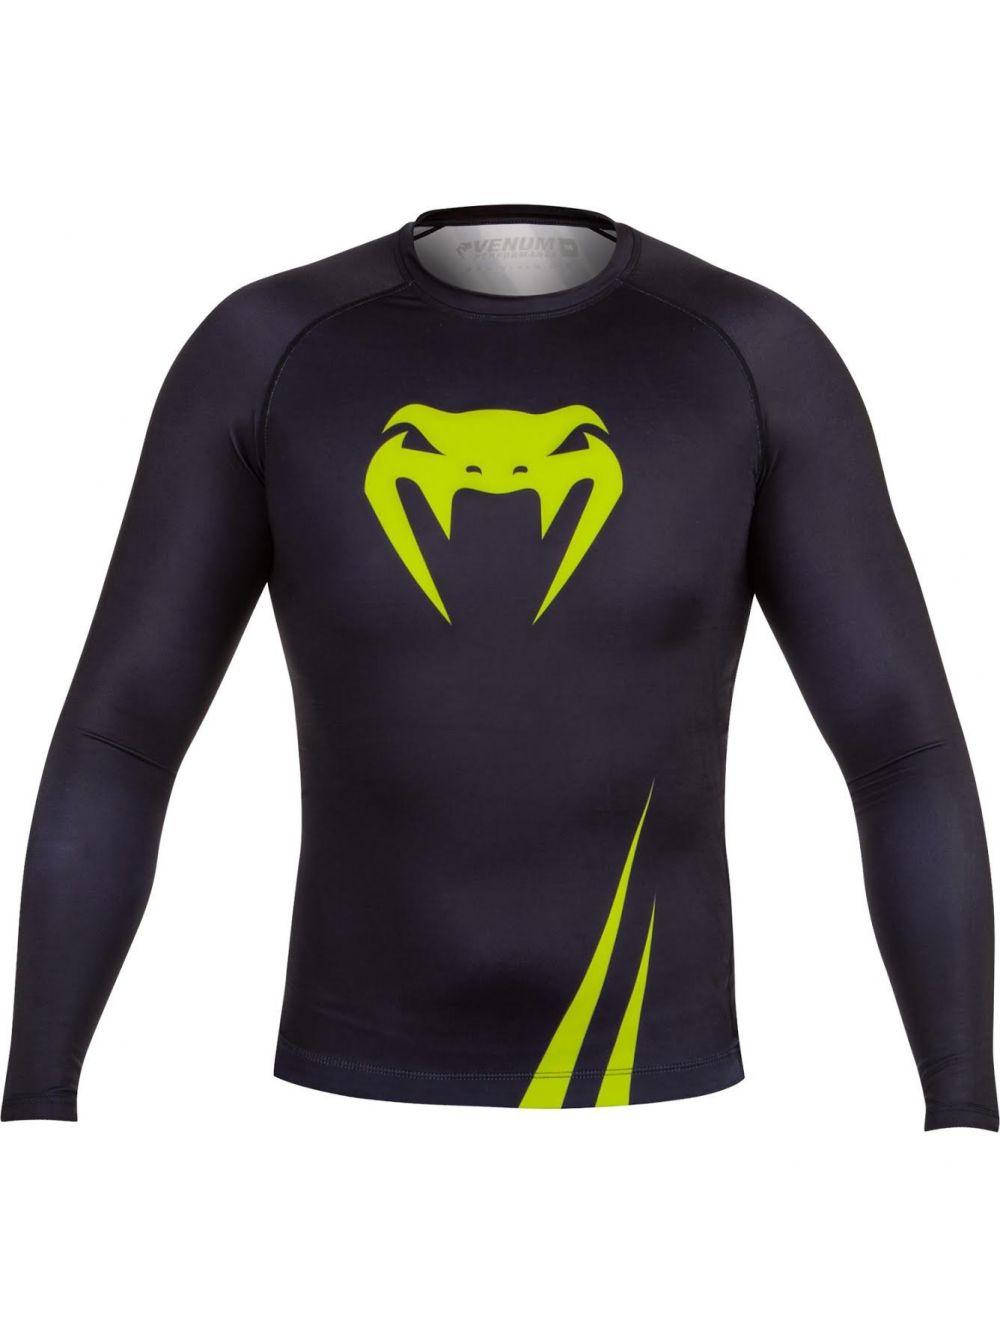 Купить Рашгард Venum Challenger Rash Guard Long Sleeves Black/Yellow, 3840_bk_yl